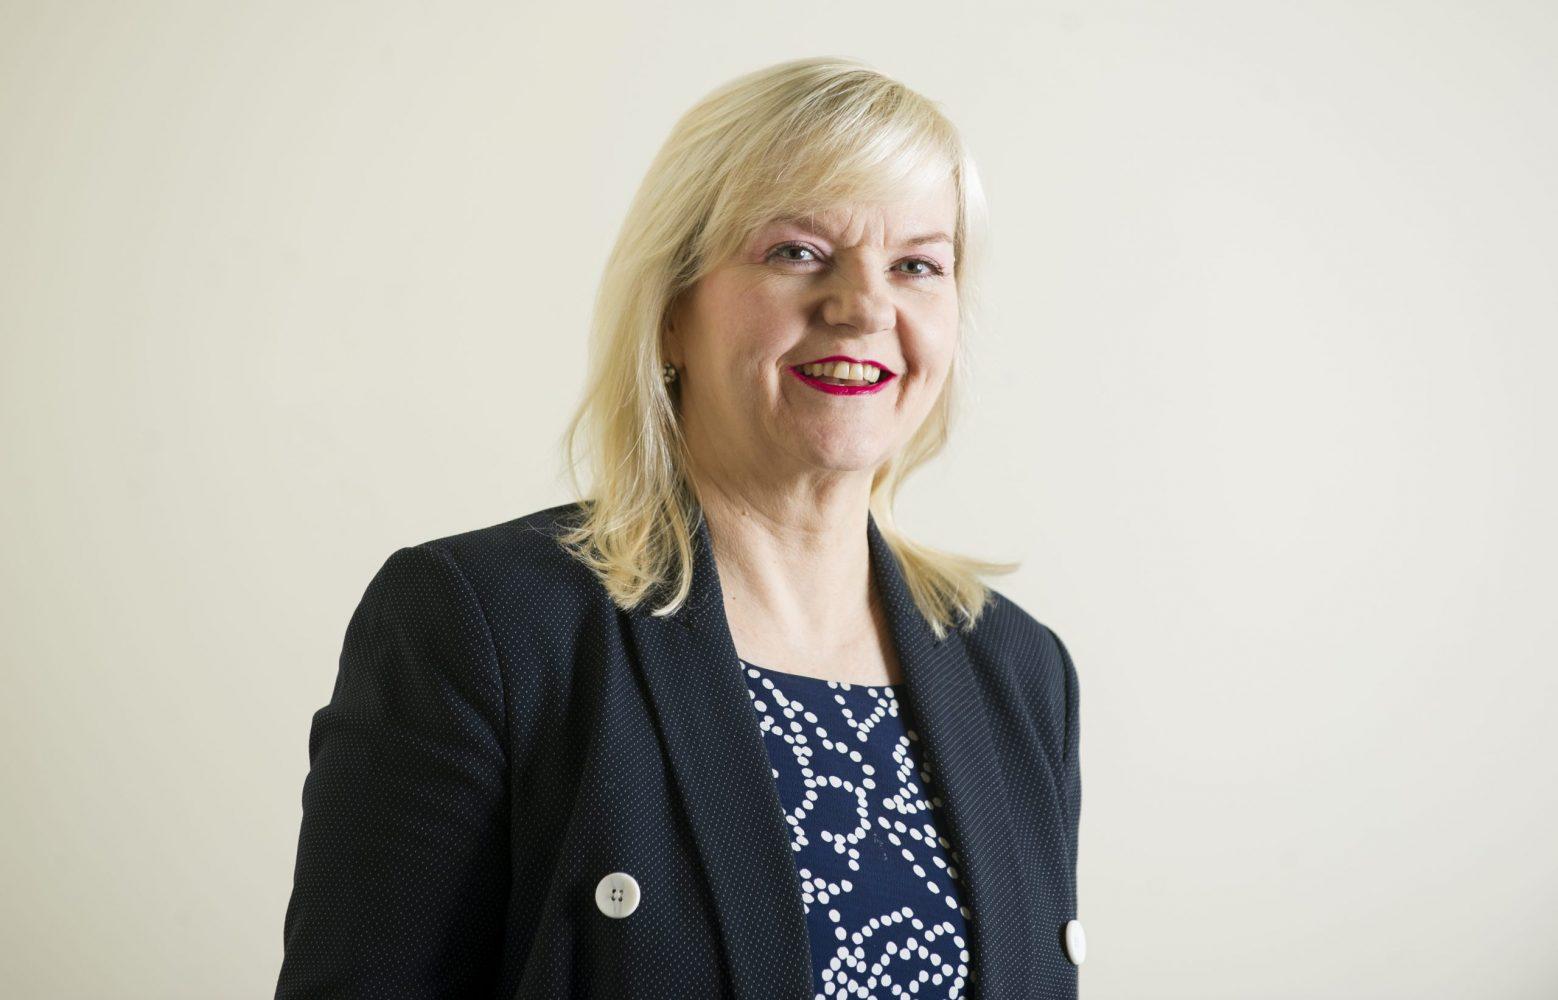 A headshot of Jo Lappin, Chief Executive of Cumbria LEP